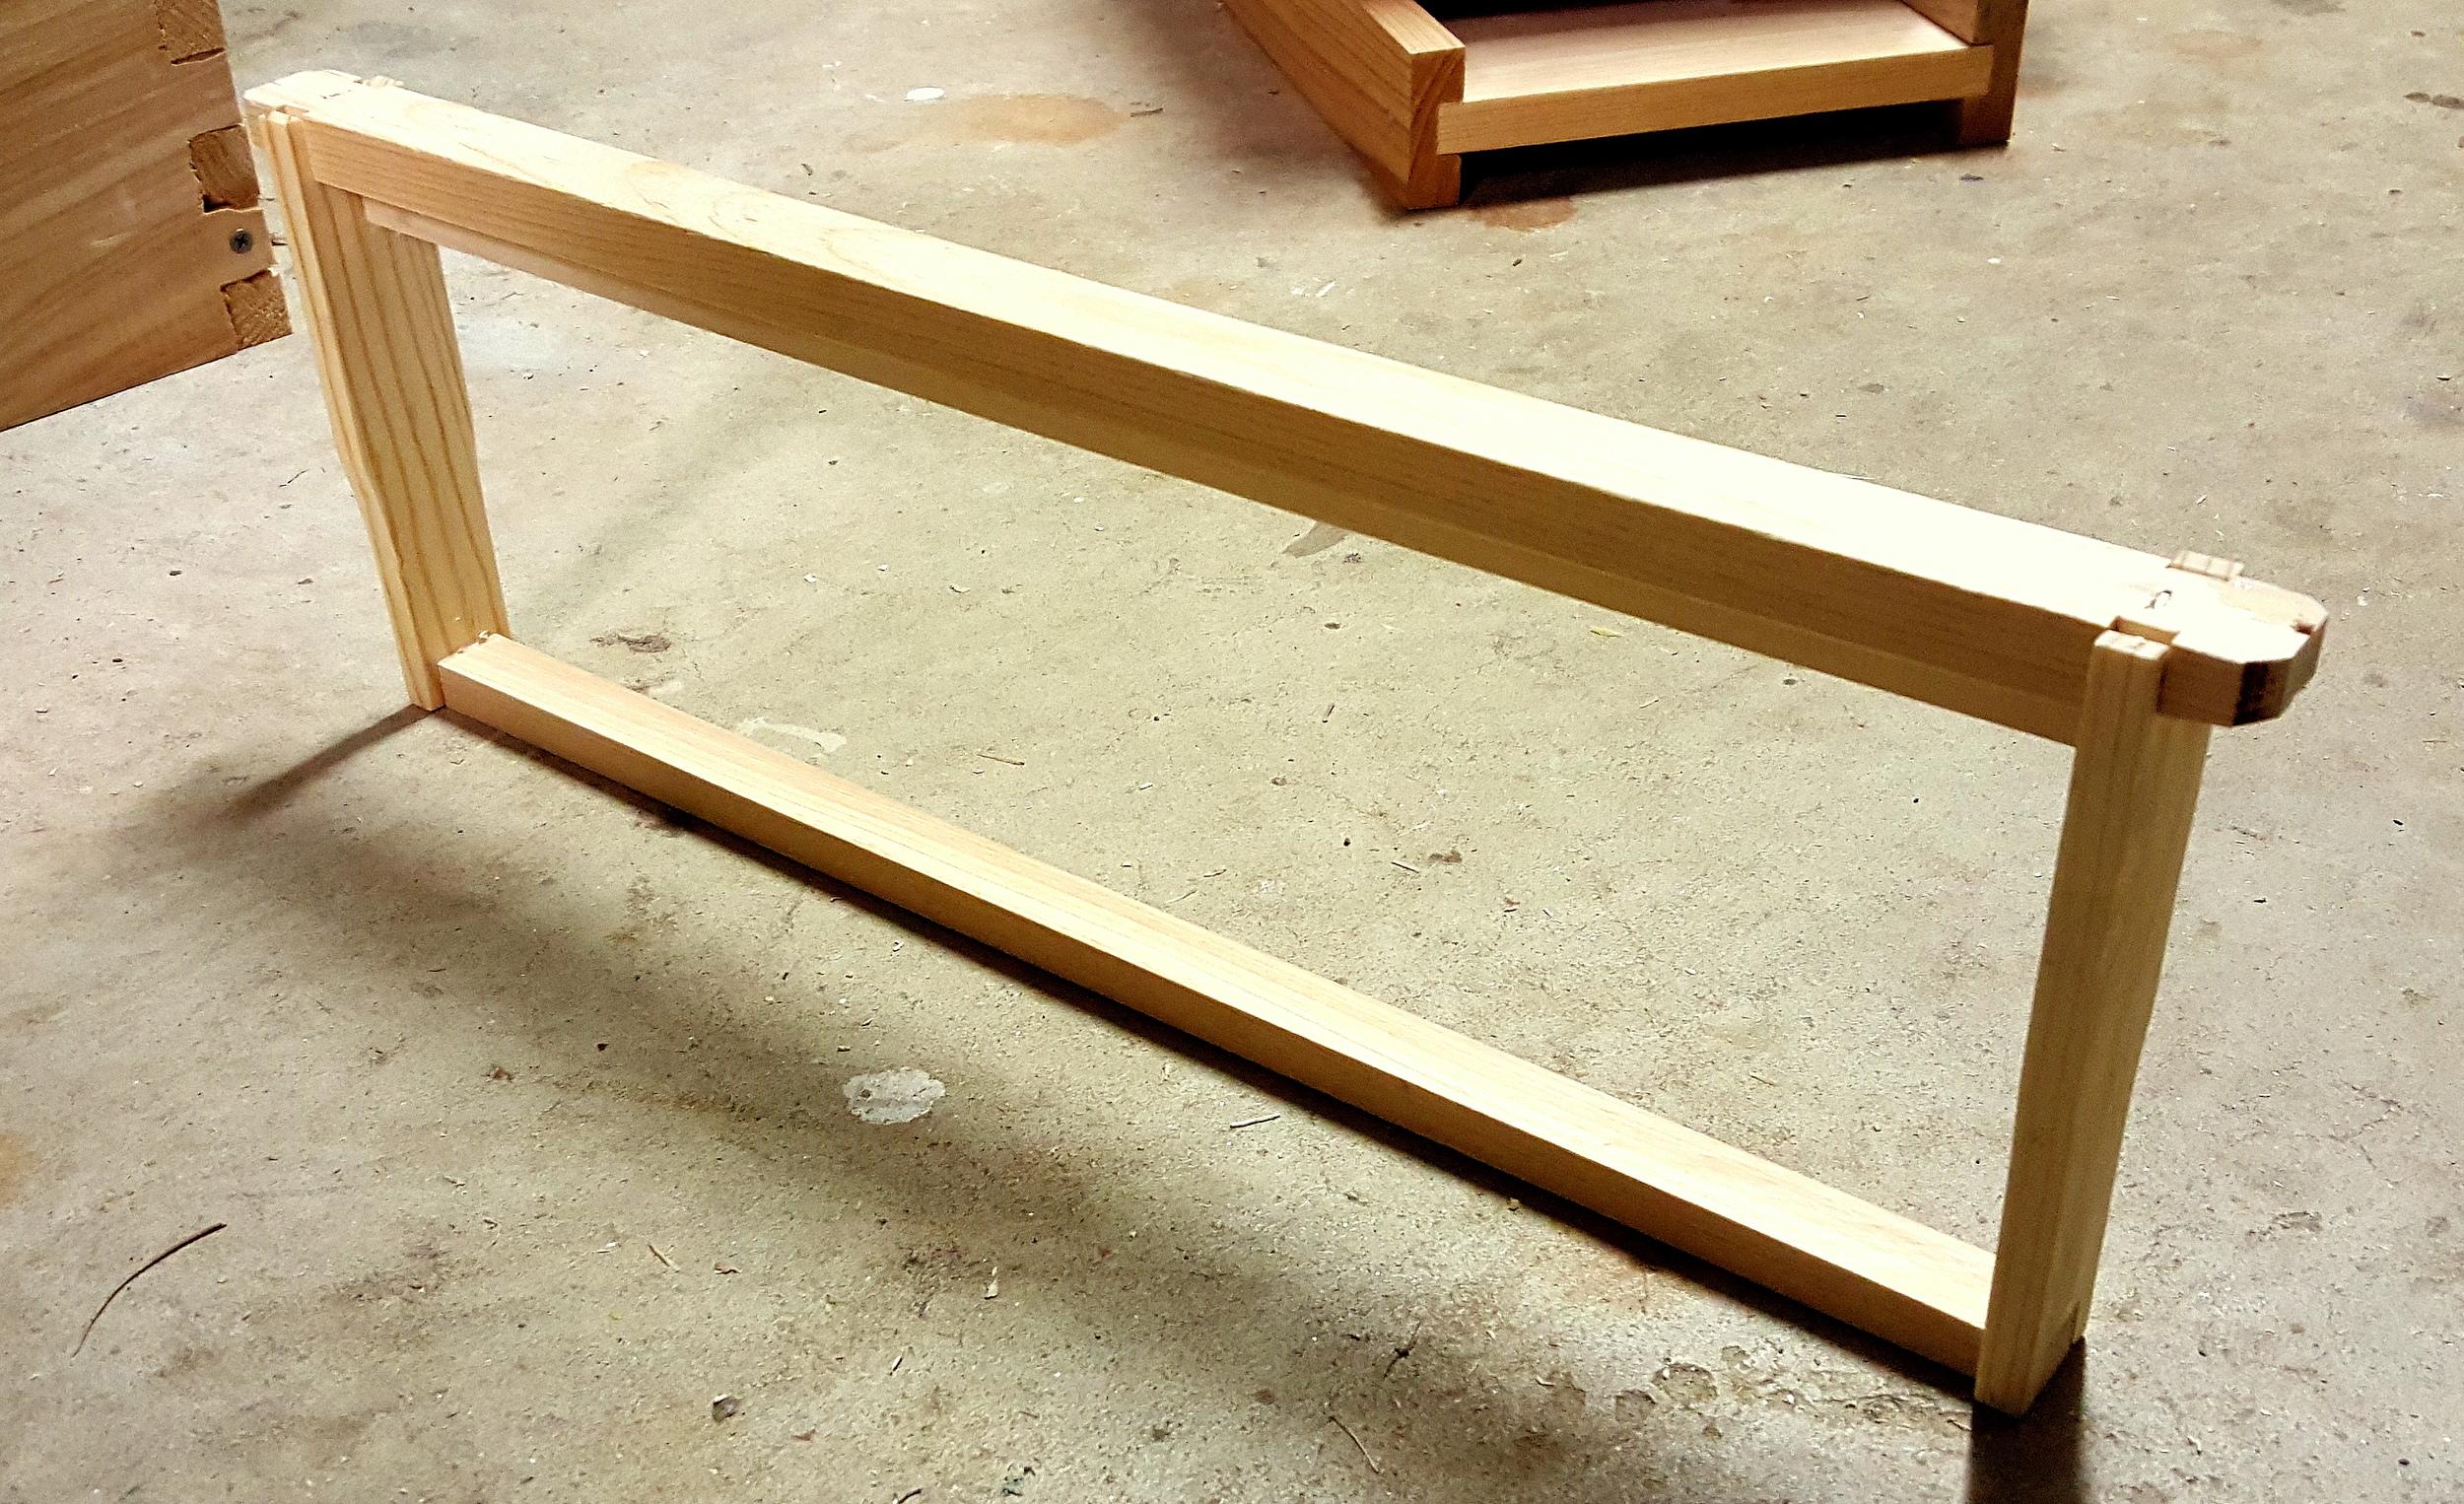 Foxhound Assembled Foundationless Frame